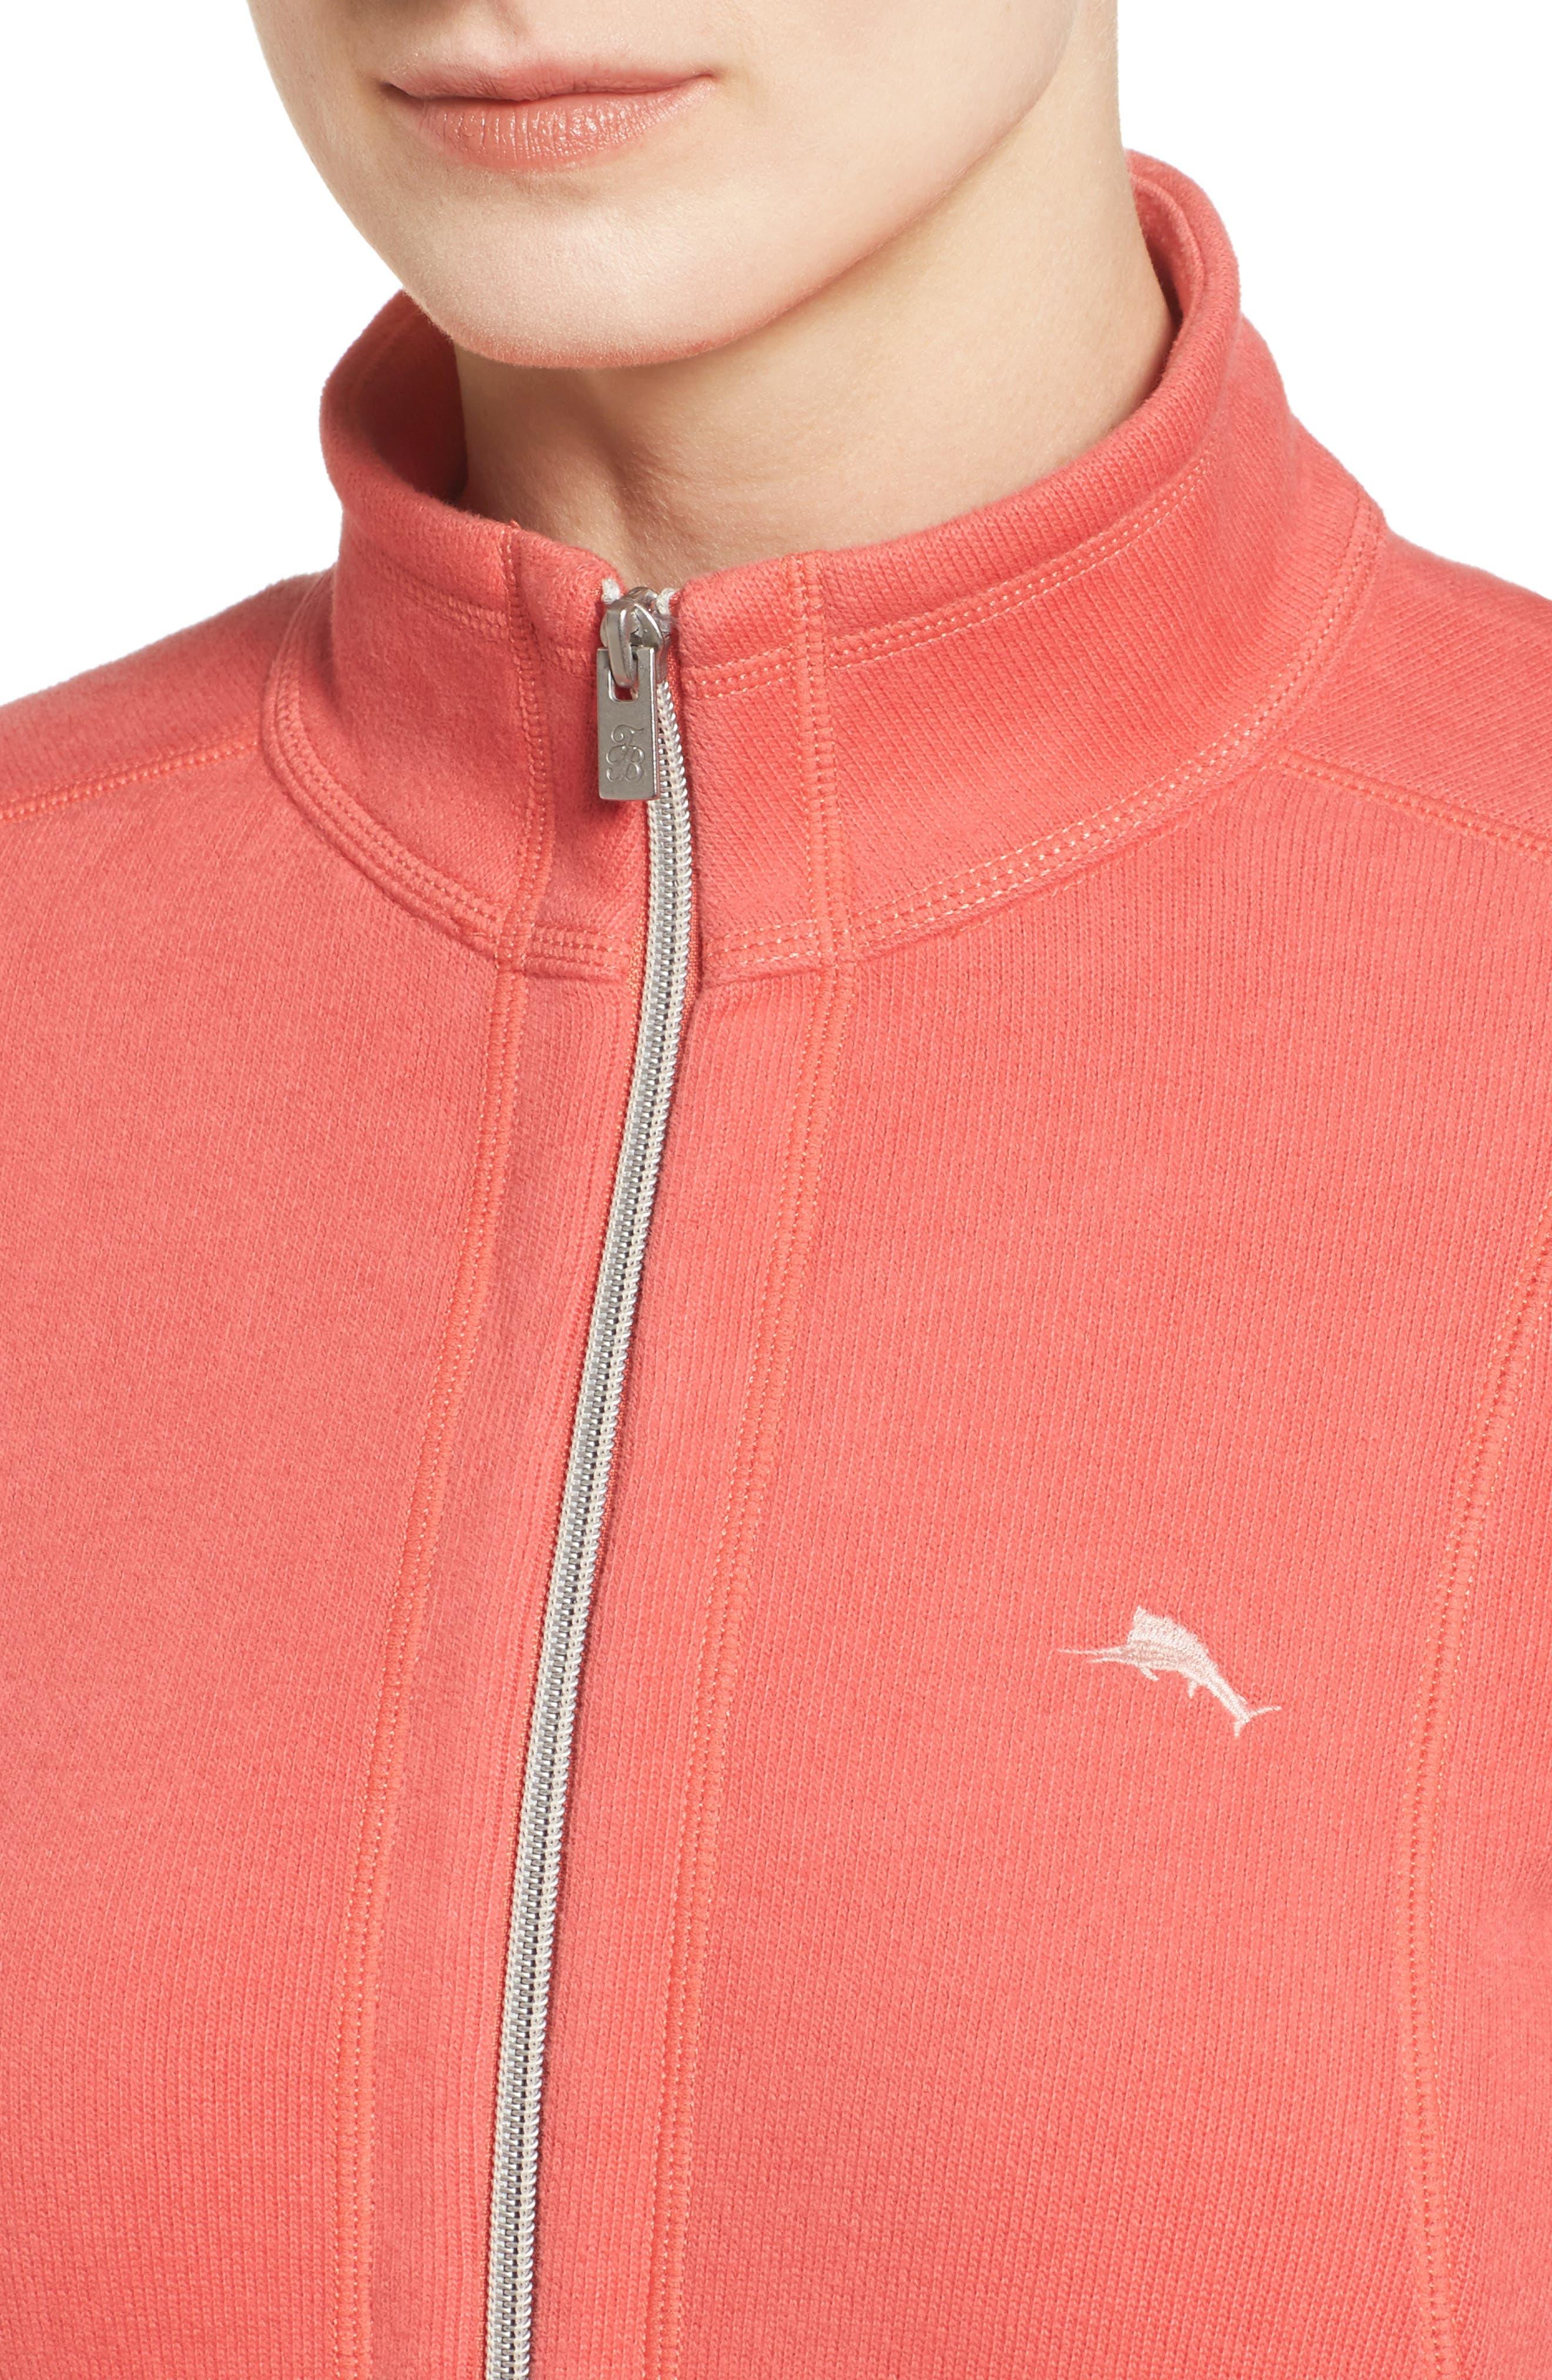 'Aruba' Full Zip Sweatshirt,                             Alternate thumbnail 4, color,                             Fusion